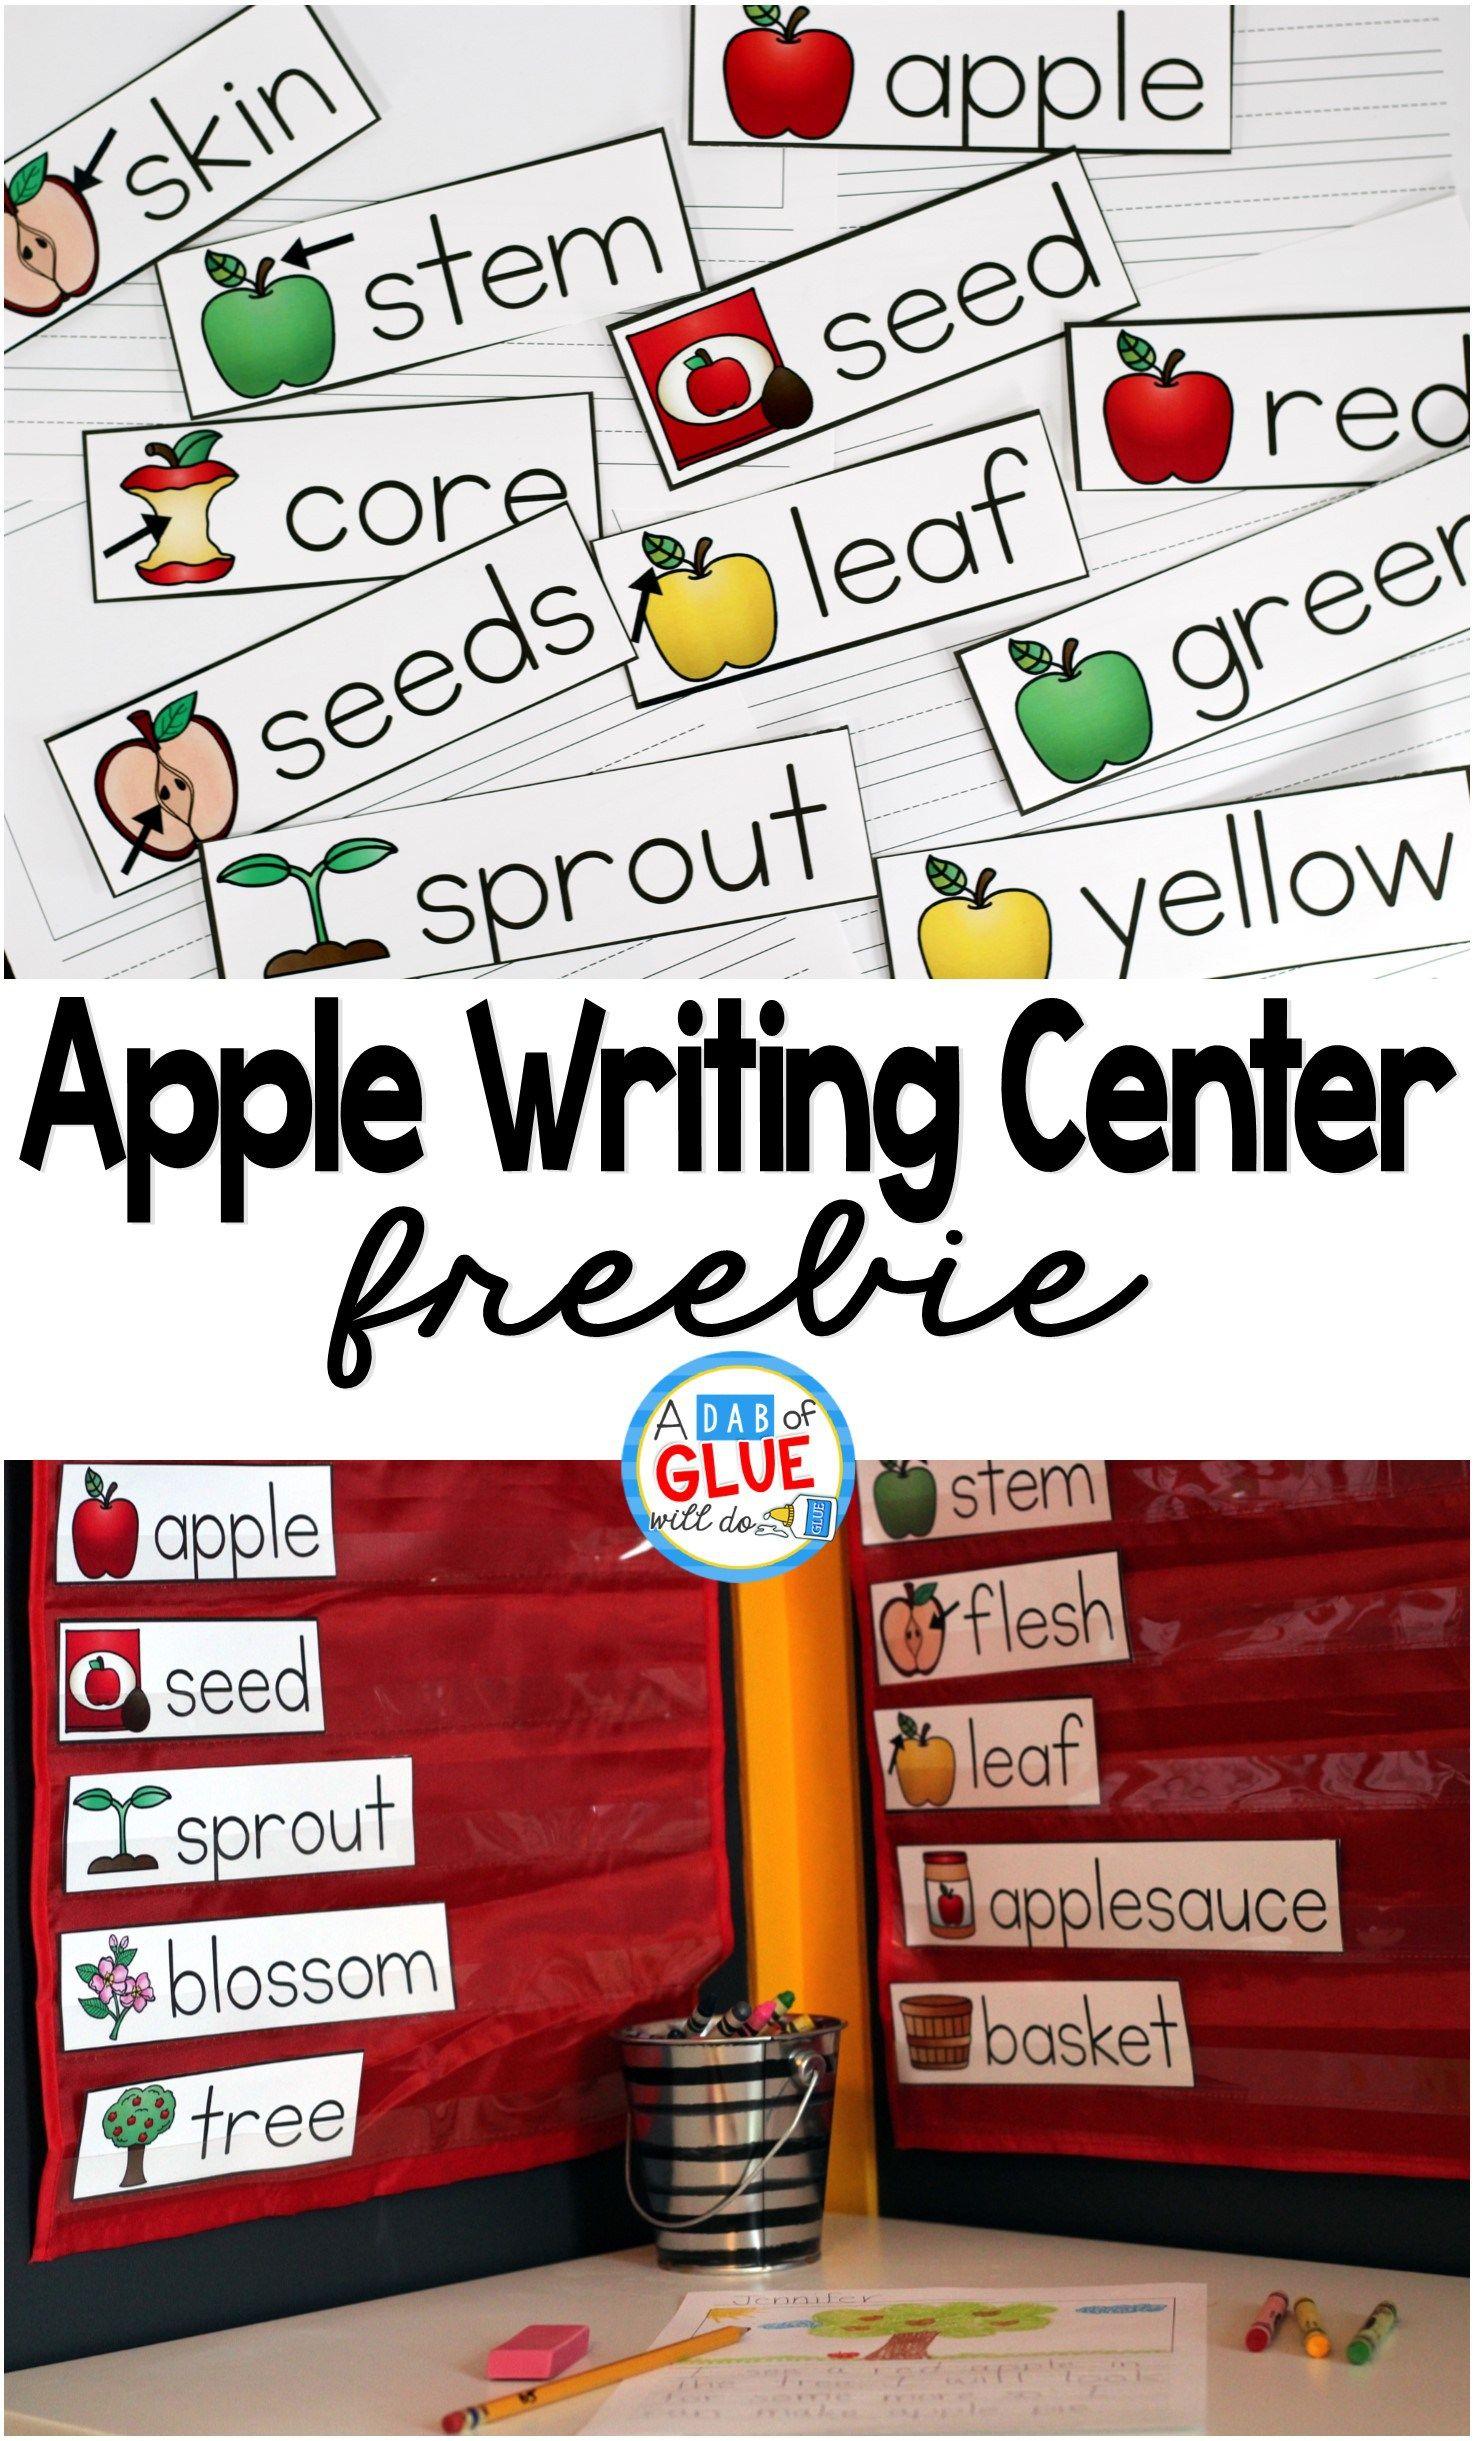 Apple Writing Center